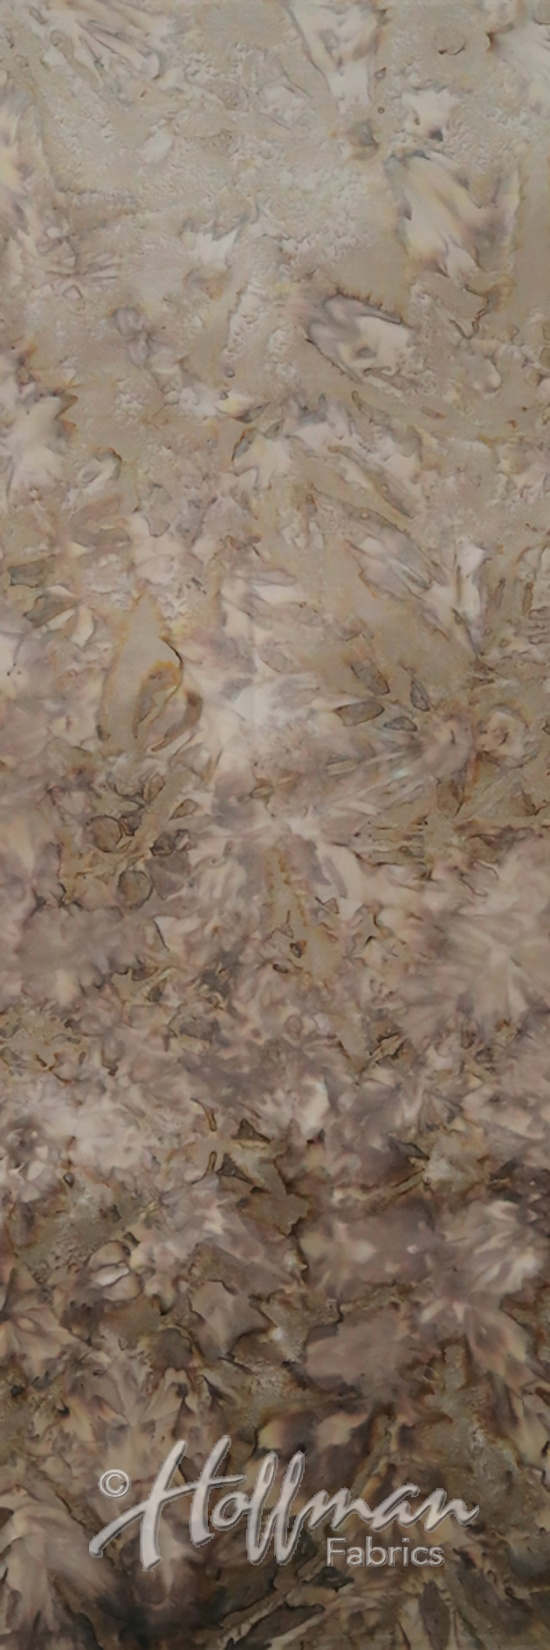 Hoffman 851-305-Gravel Bali Fabrics